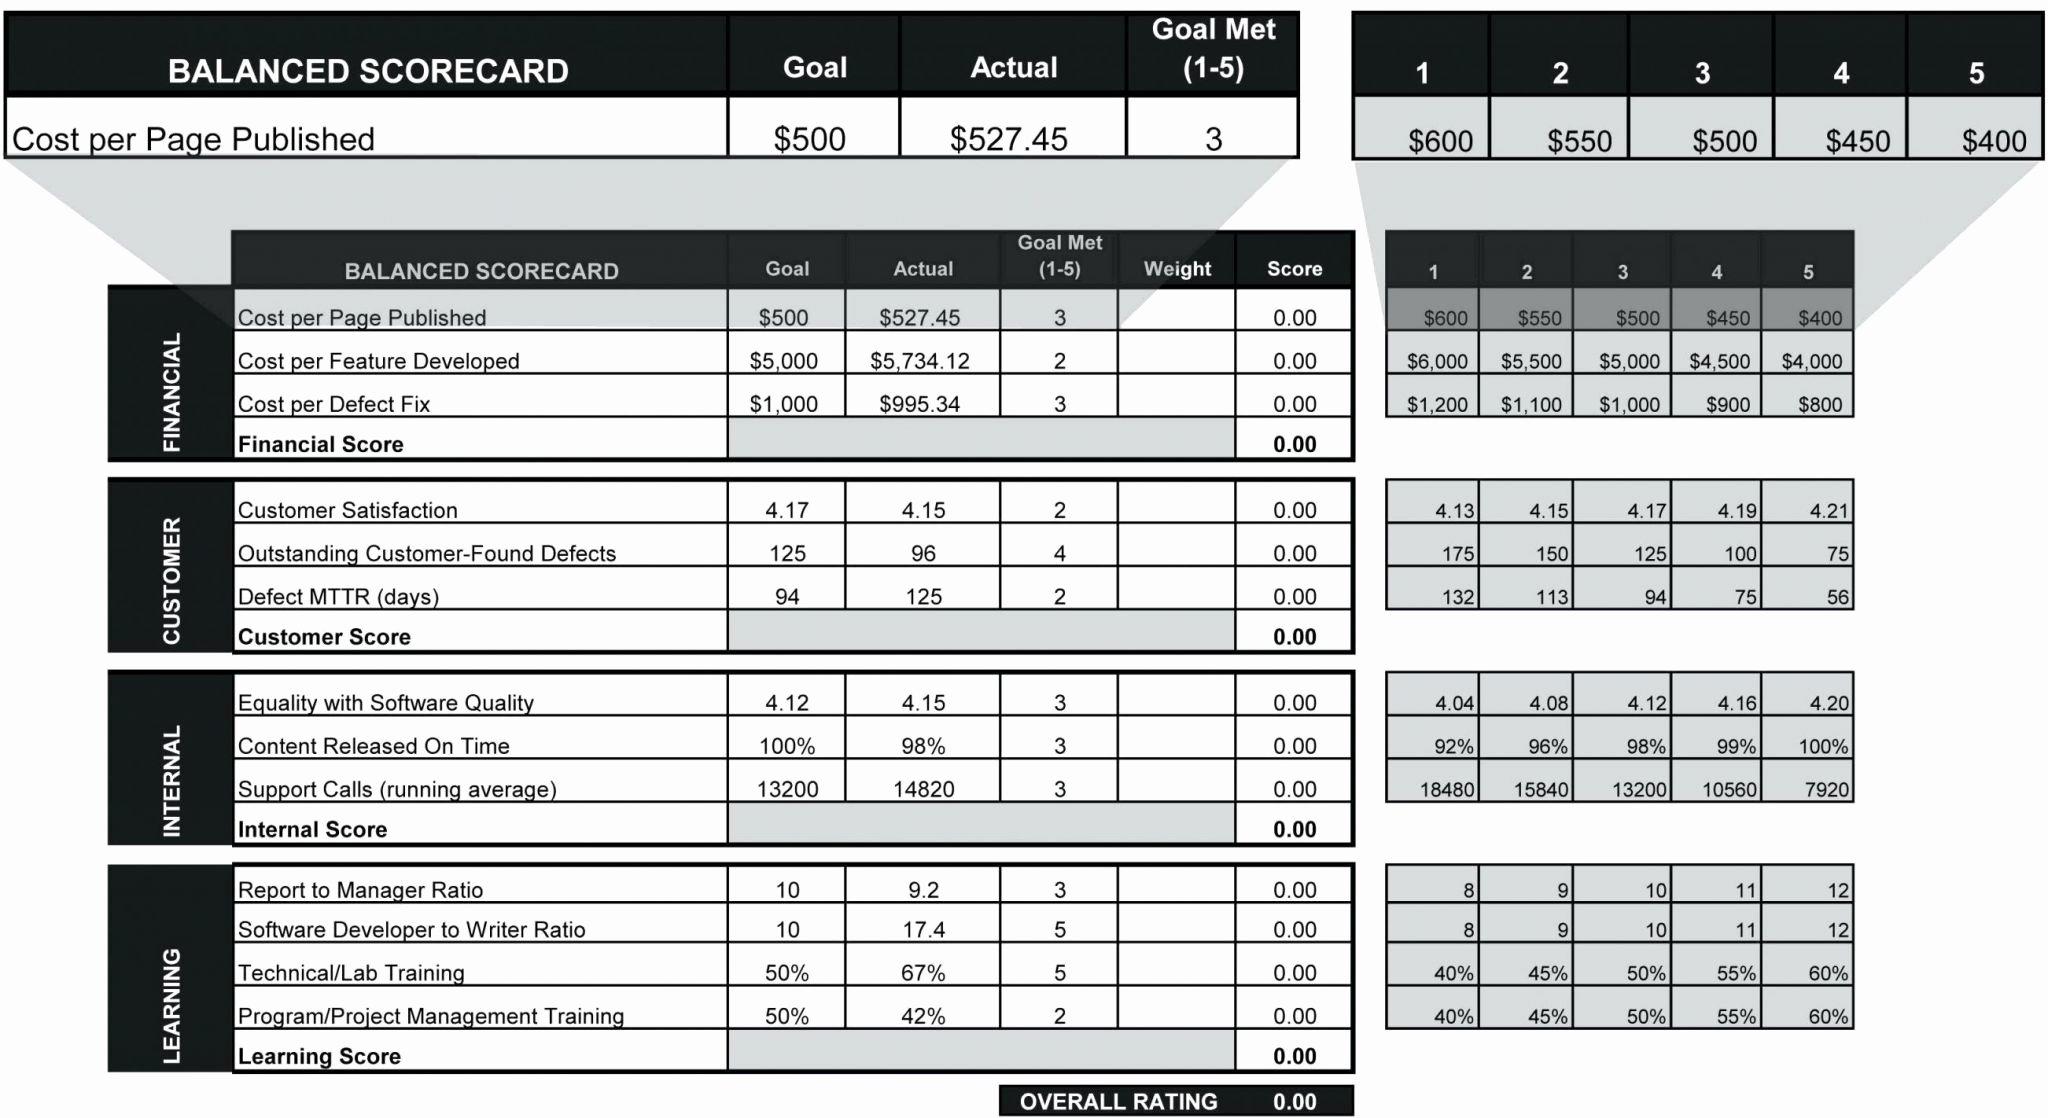 Employee Scorecard Template Excel Lovely Employee Performance Scorecard Template Excel and Best Hr